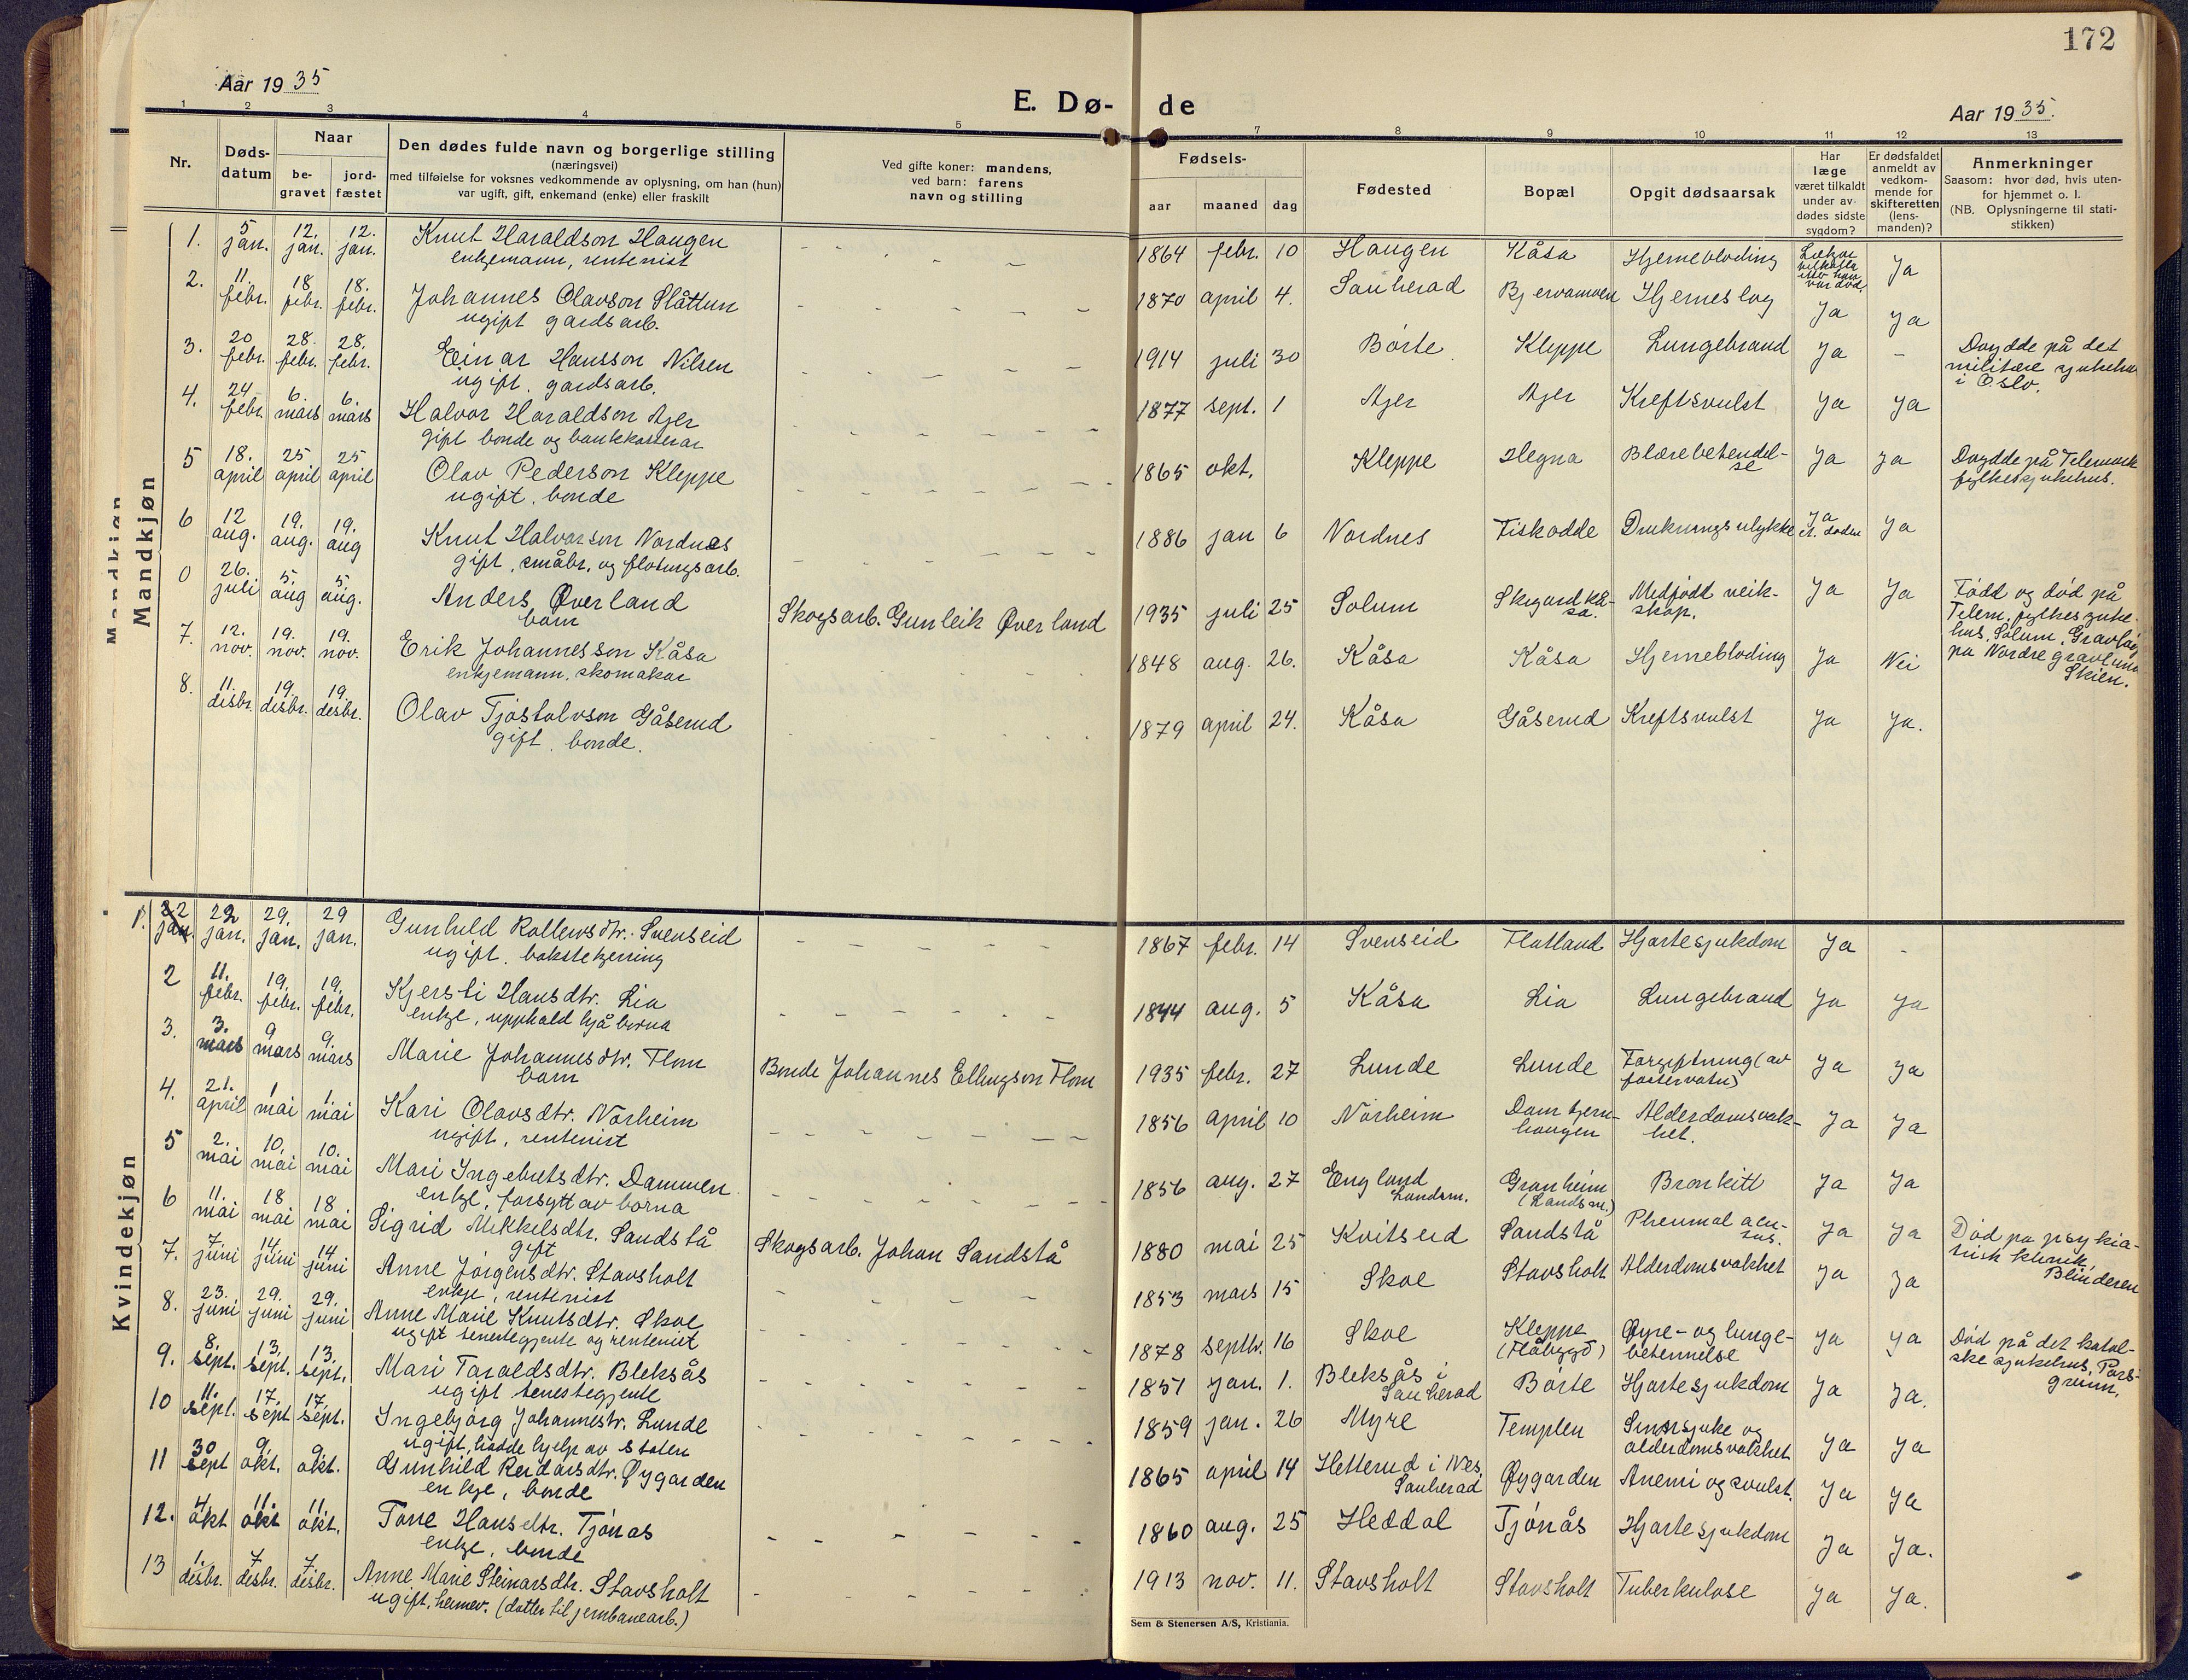 SAKO, Lunde kirkebøker, F/Fa/L0006: Ministerialbok nr. I 6, 1922-1940, s. 172